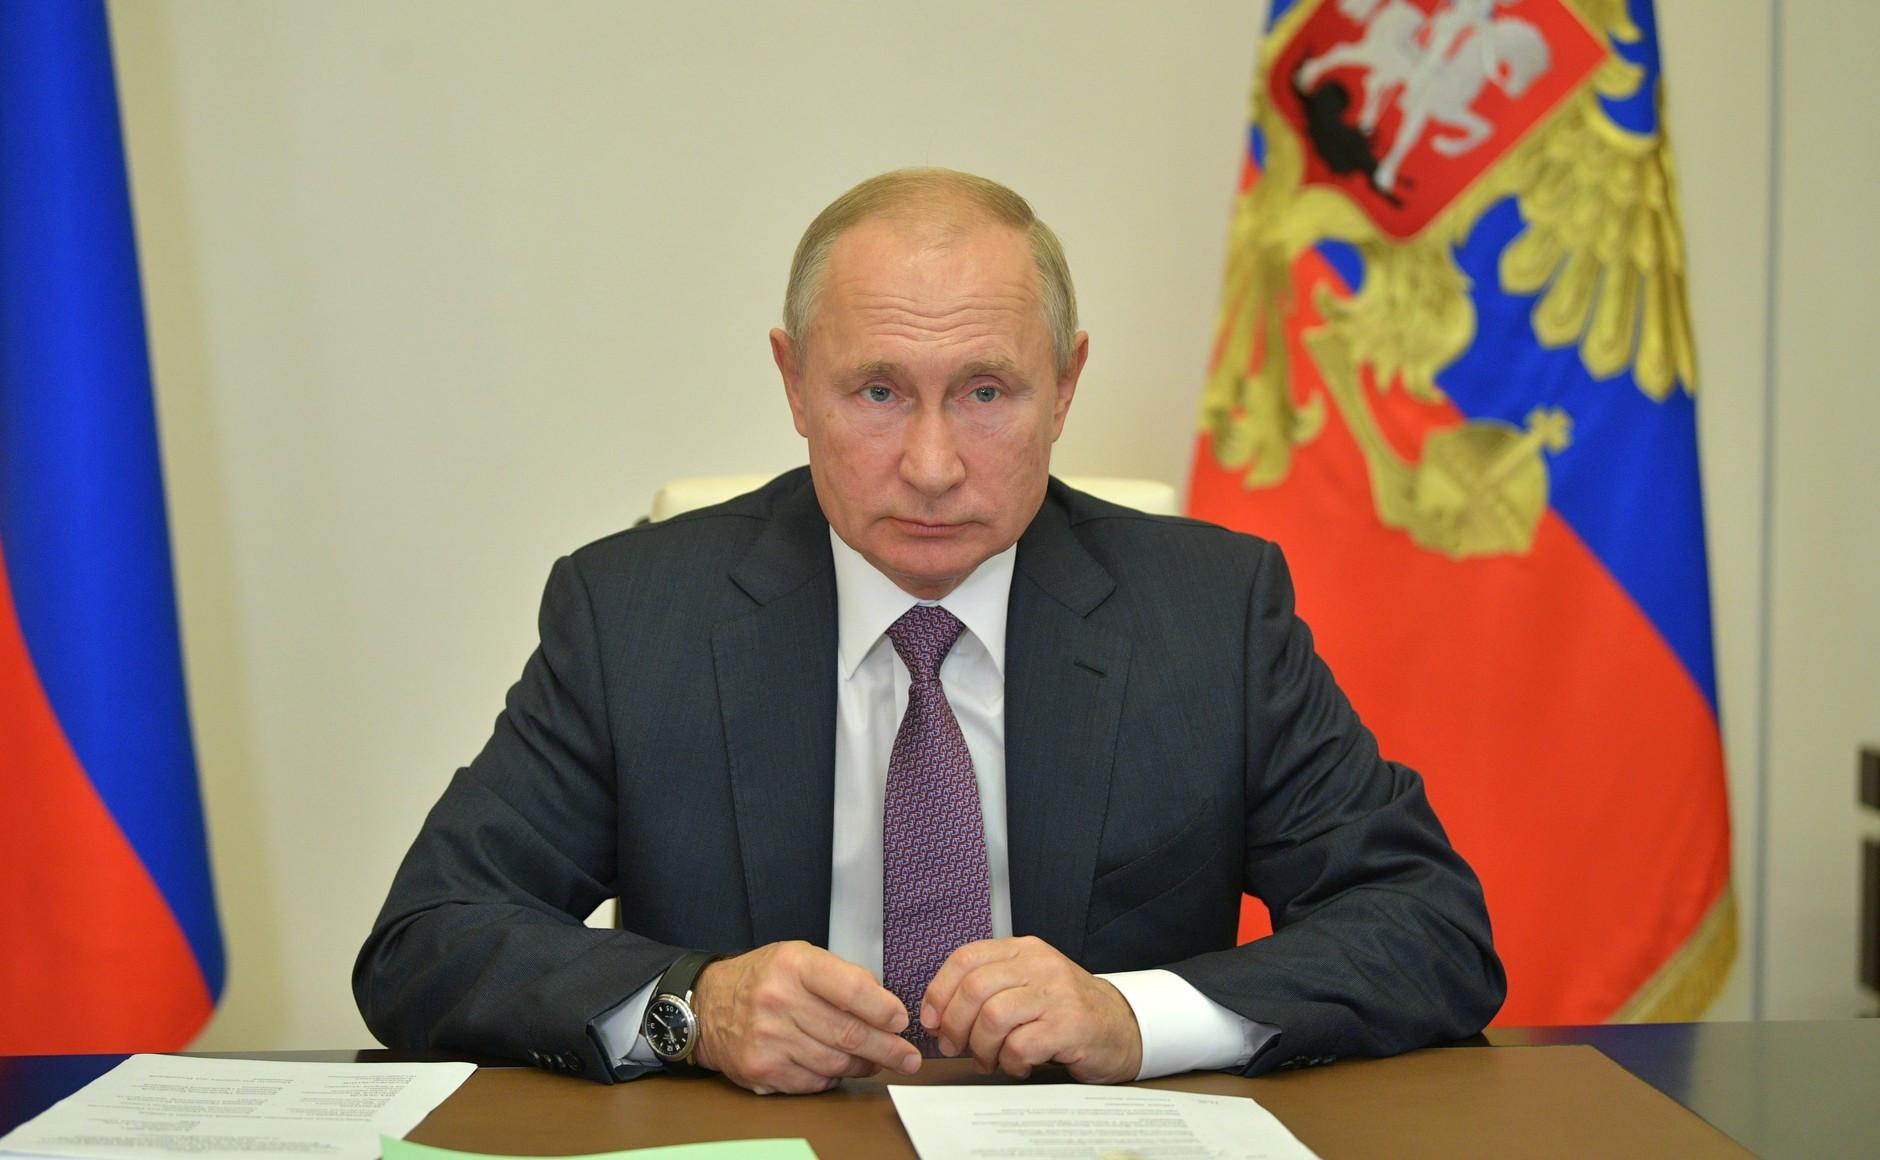 Putin congratulates Repilov for world luge gold under new WADA sanction conditions